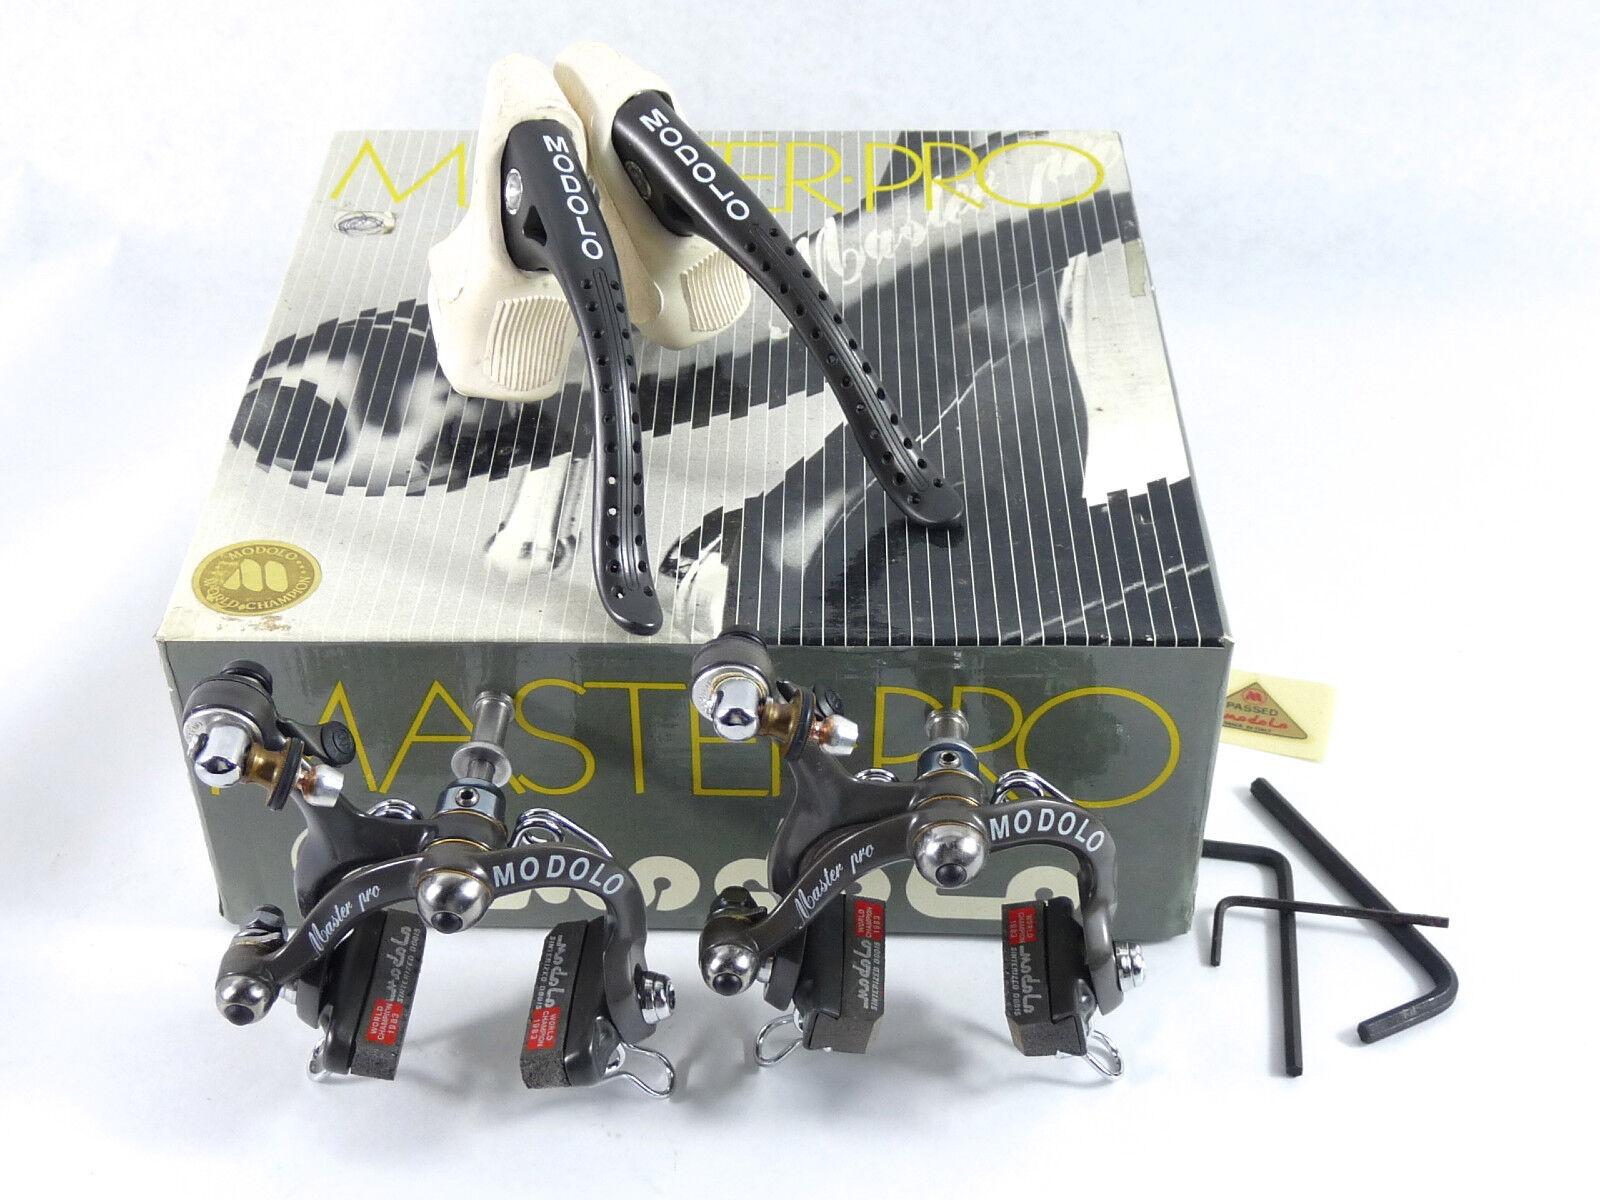 Modolo Master Pro brake set Titanium Vintage  Lemond Racing Bicycle Hinault NOS  incredible discounts